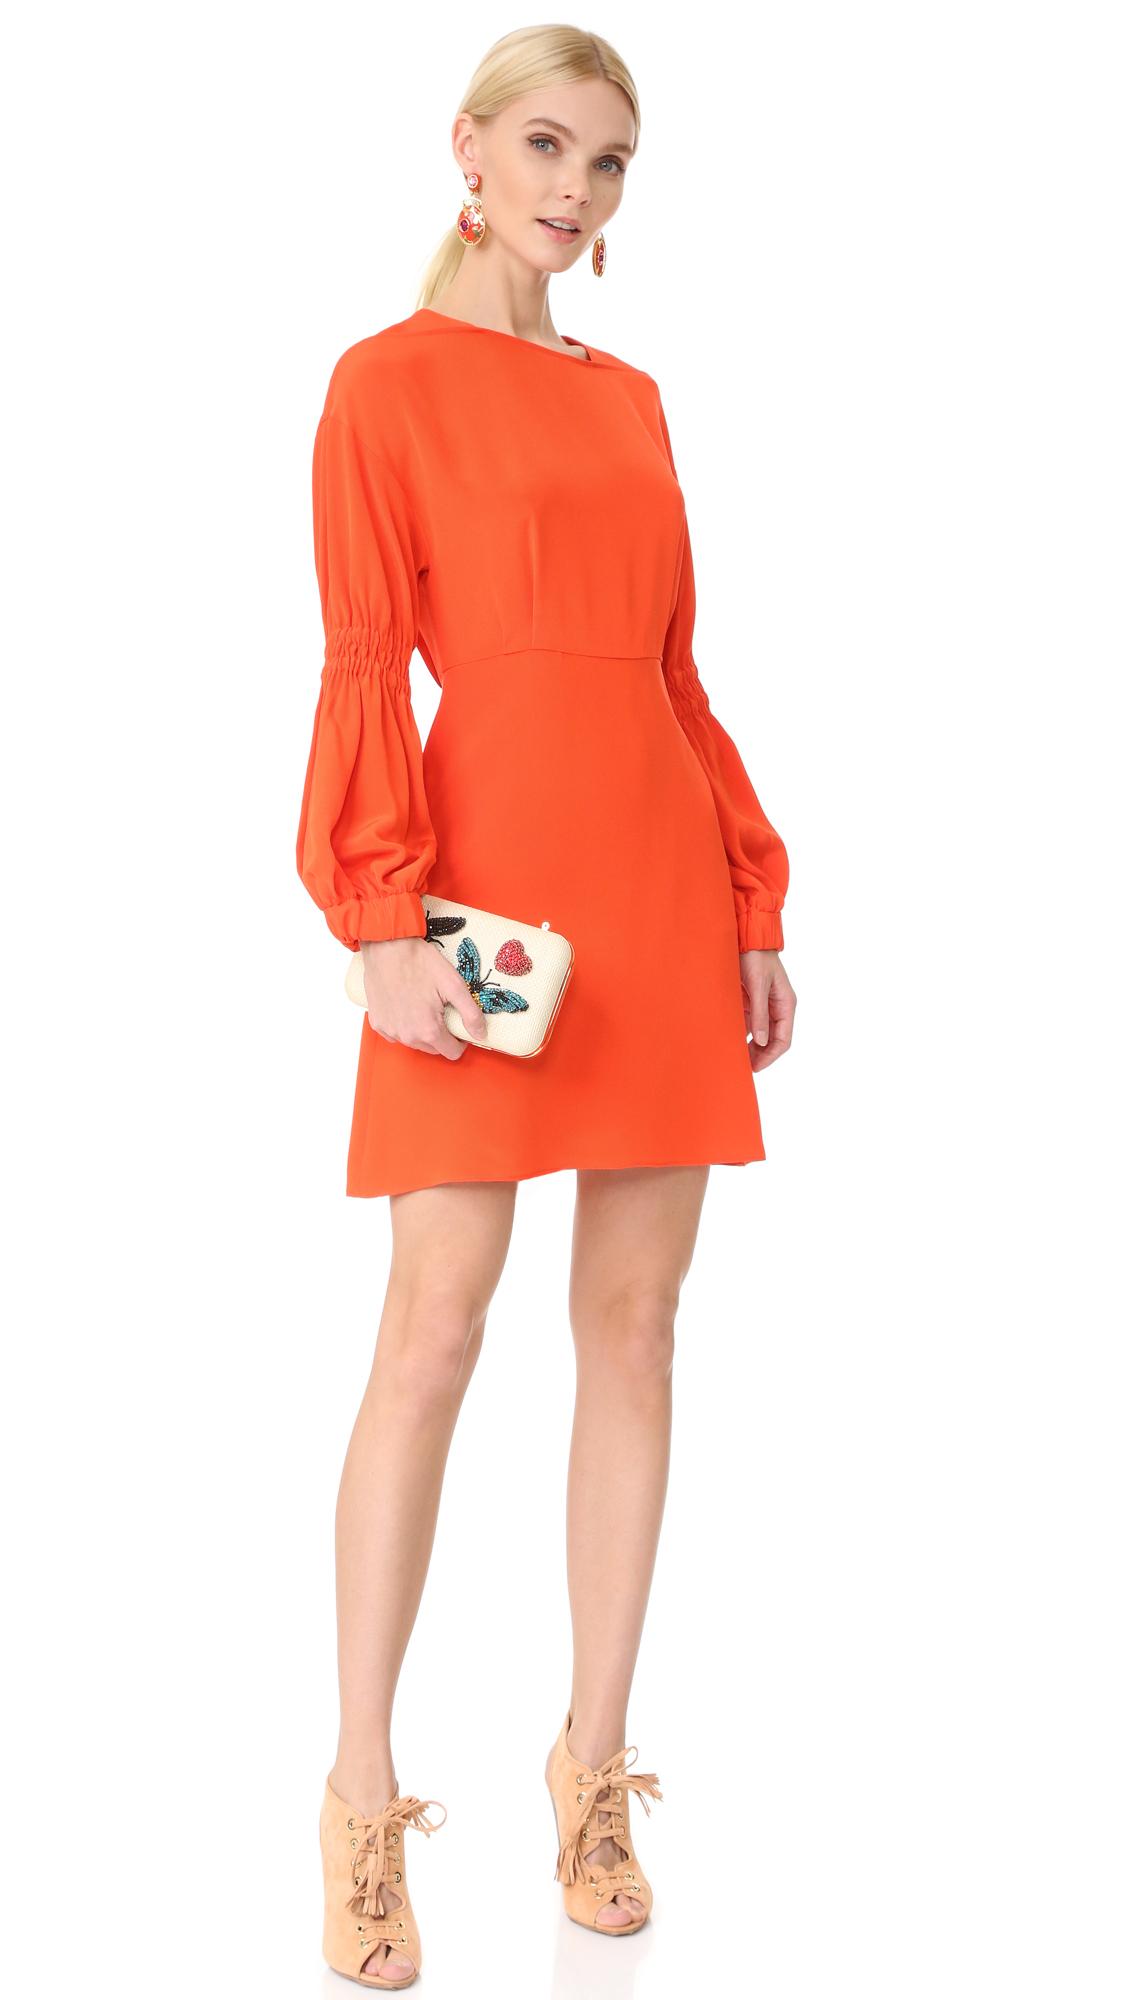 d3236ecc9b0a Tibi Balloon Sleeve Short Dress | SHOPBOP